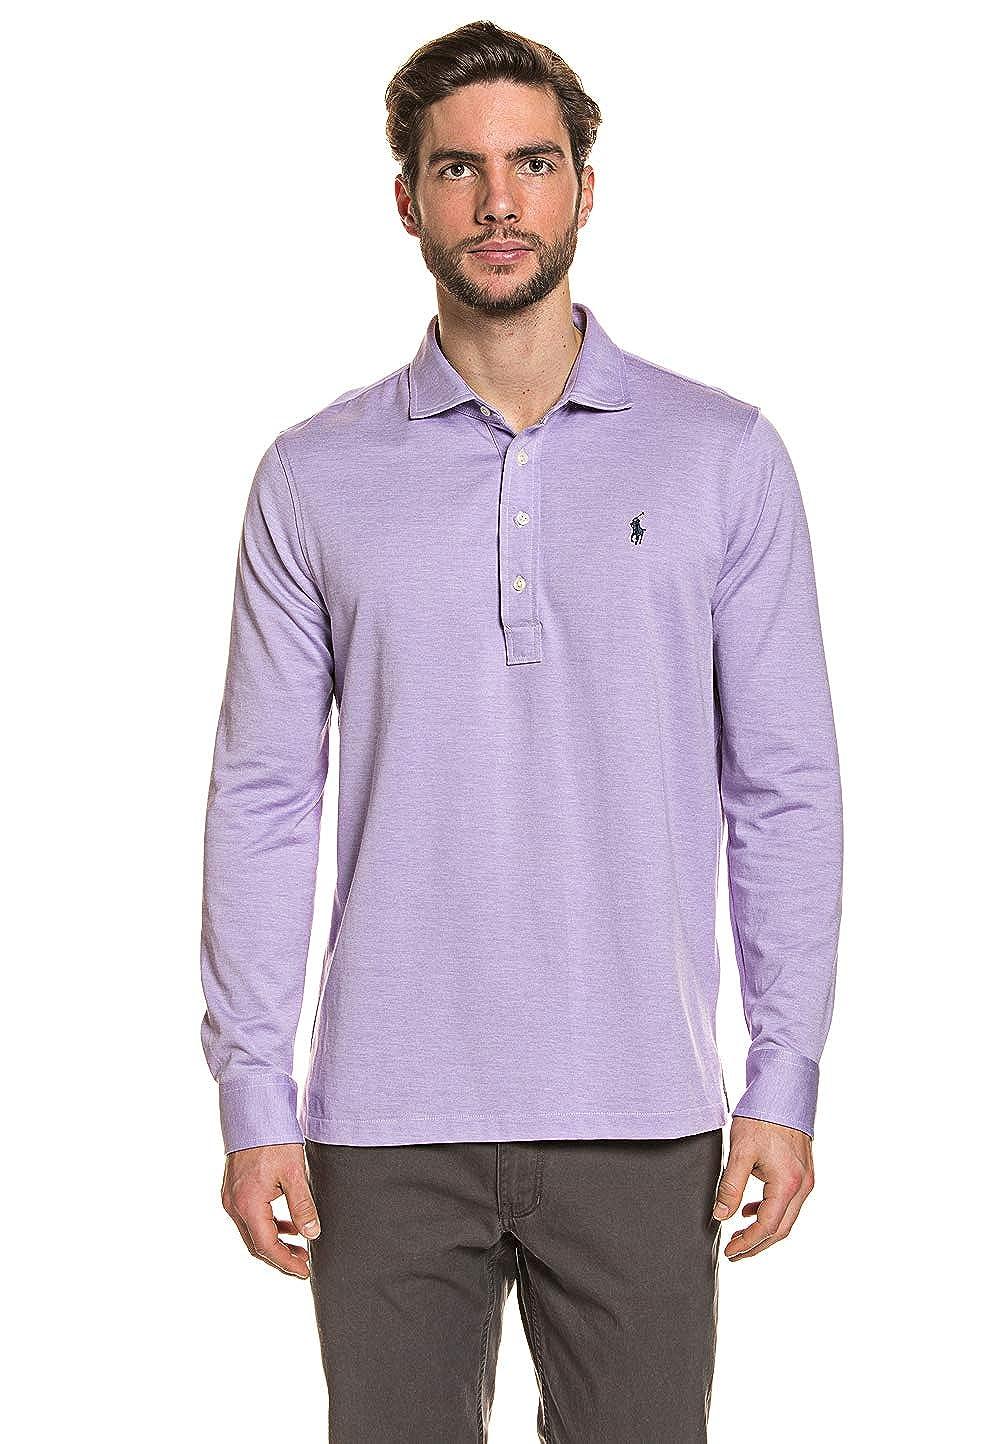 Polo Ralph Lauren MenŽs Polo Shirt Purple Fusion, tamaño:L: Amazon ...